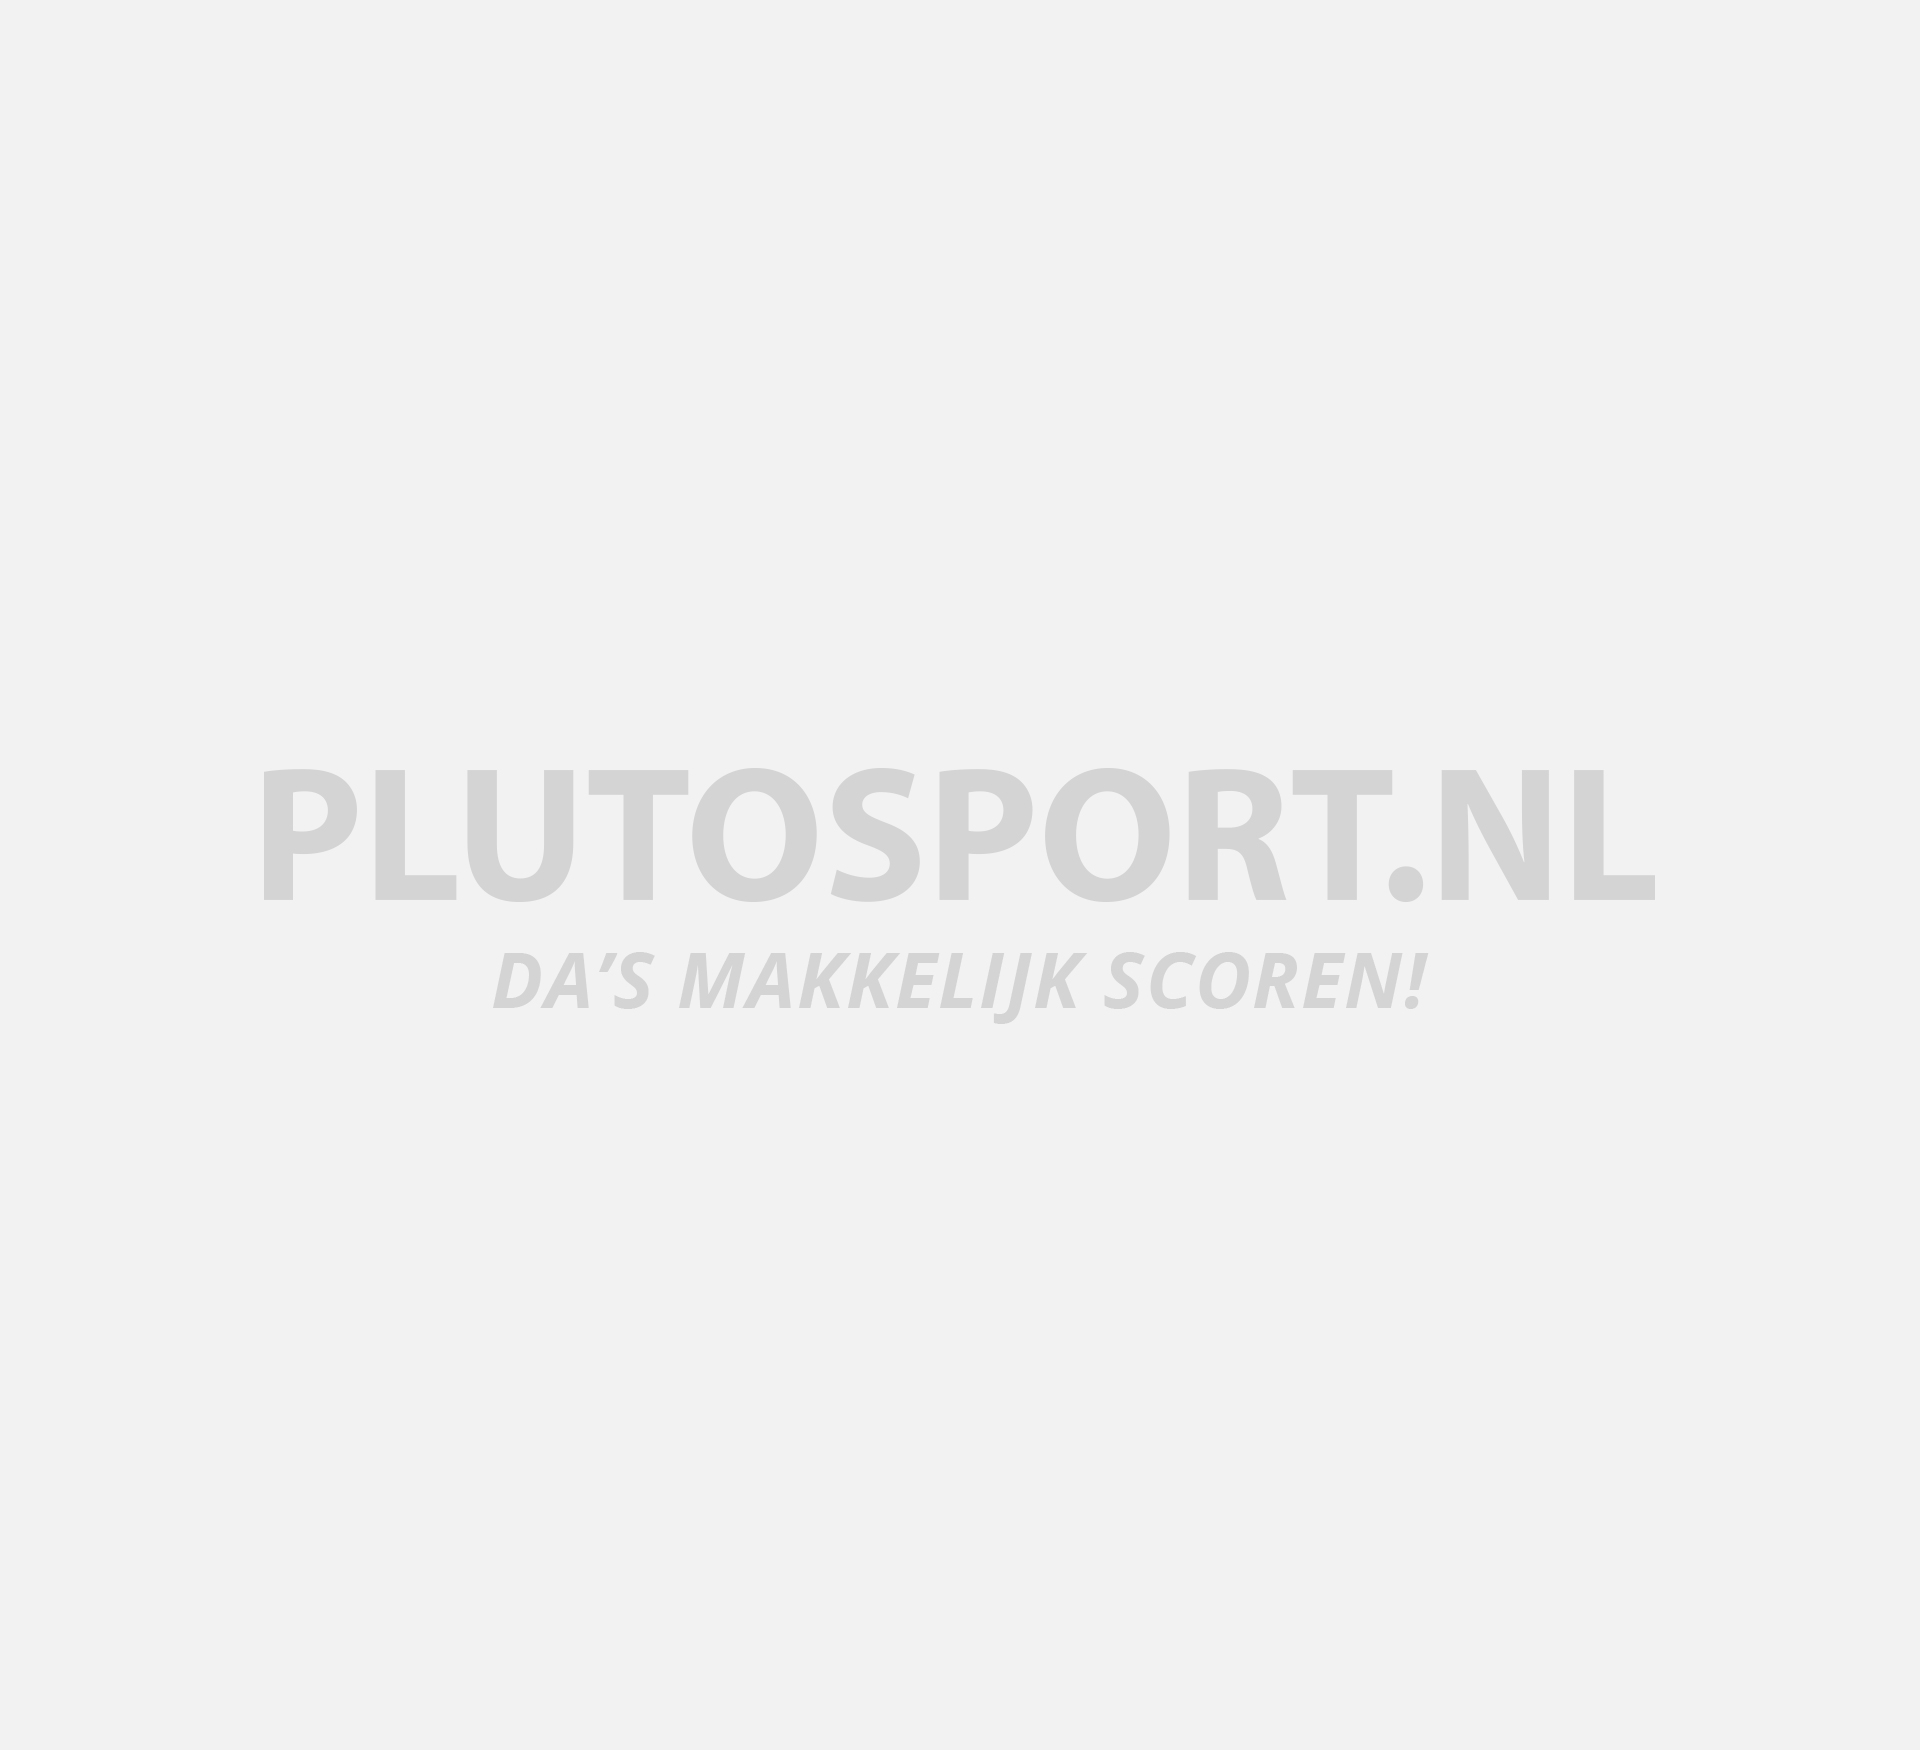 fe8b6672565a Adidas Predator Instinct AG Voetbalschoenen Heren - Schoenen vaste ...